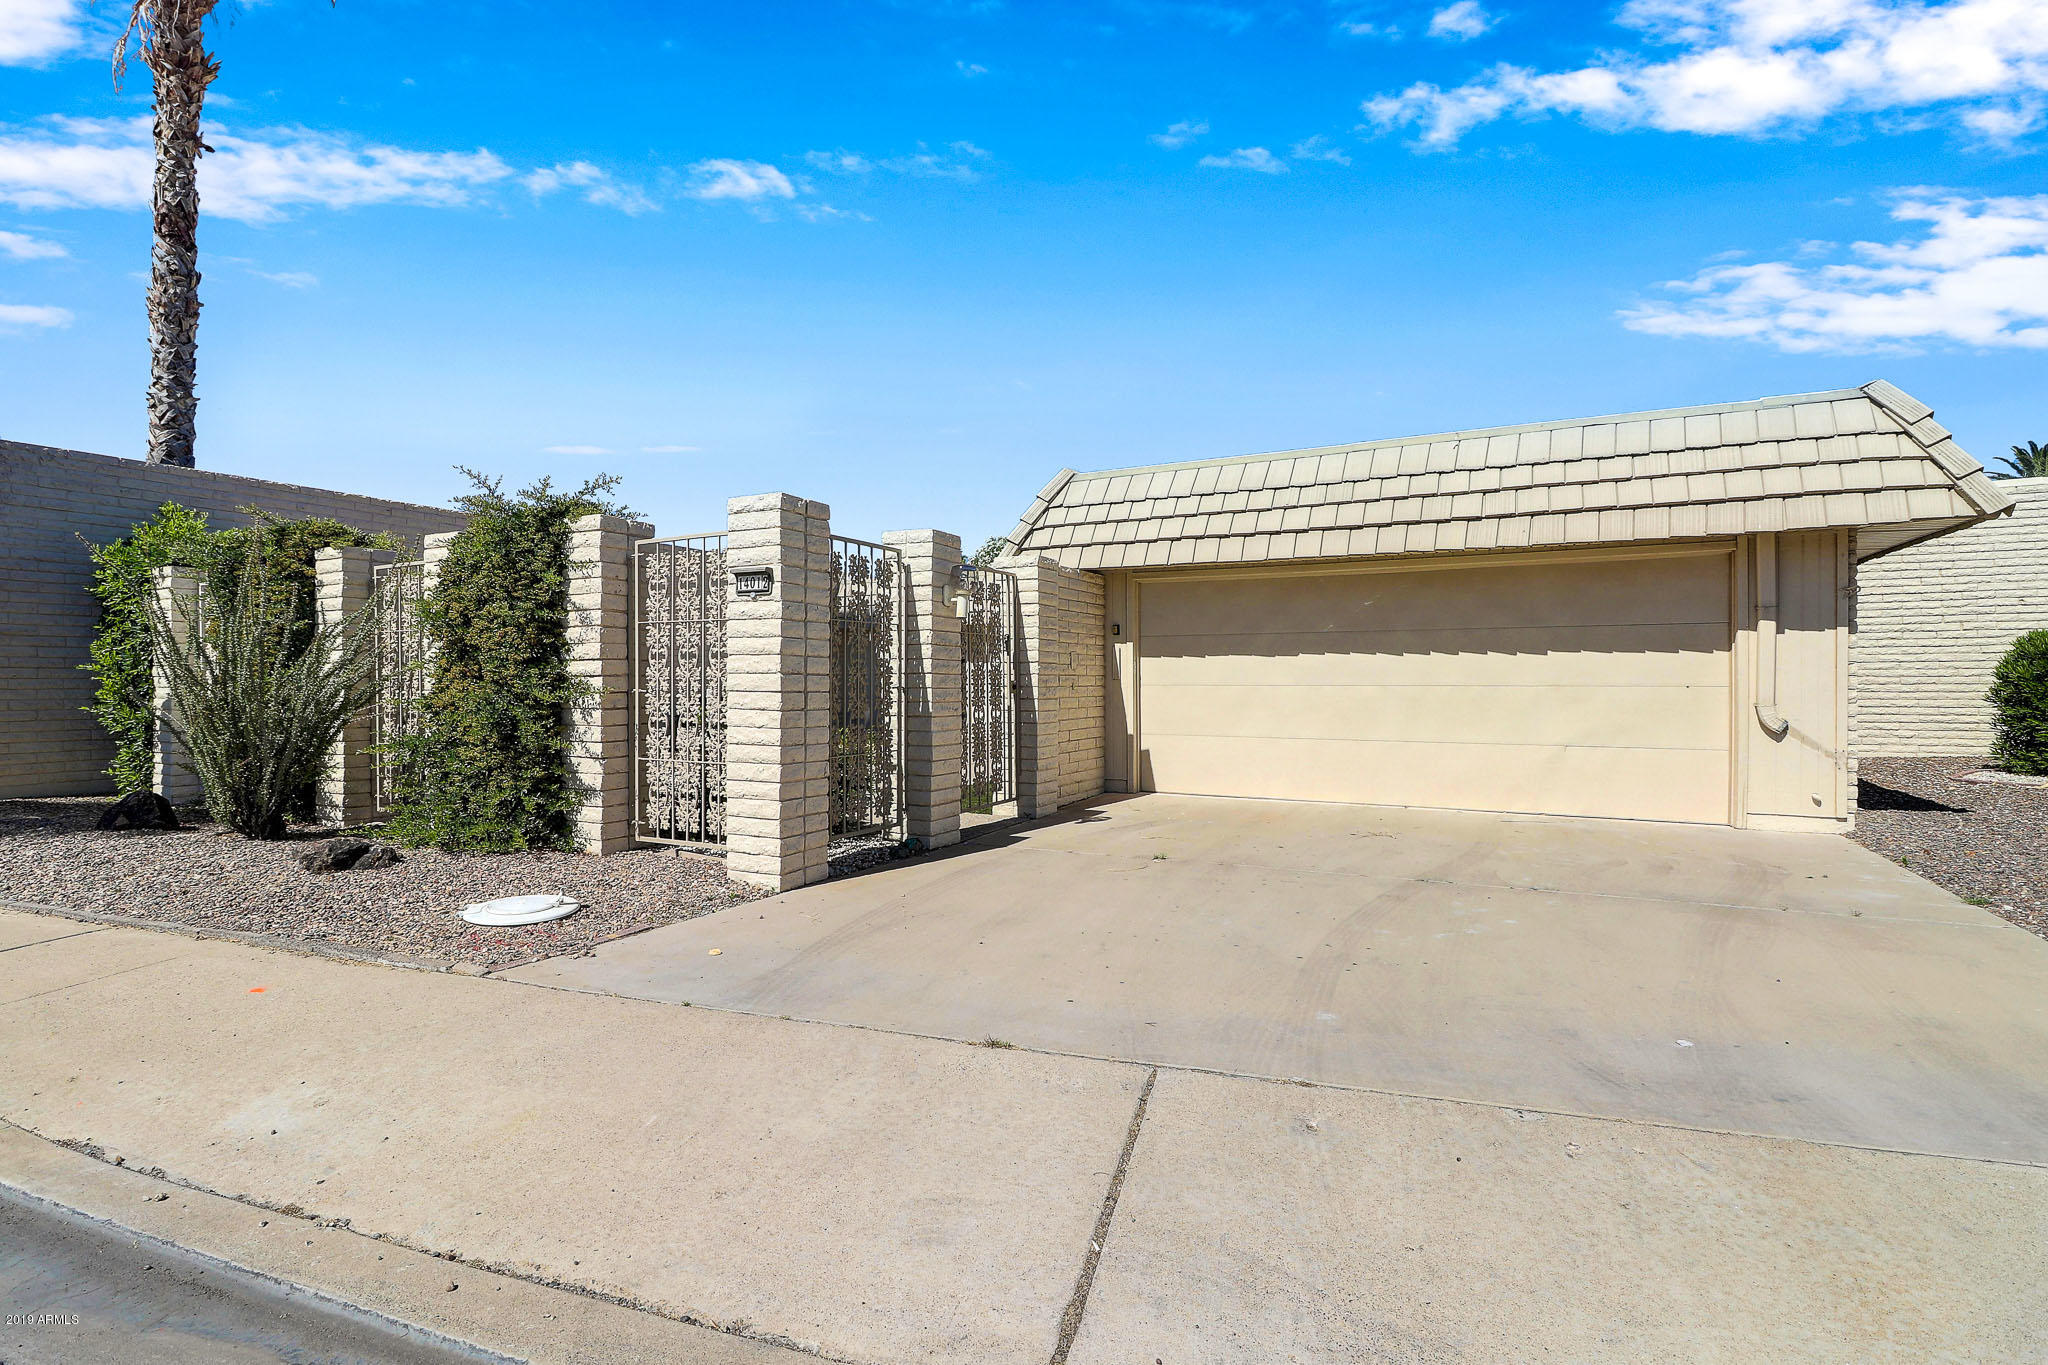 MLS 5934775 14012 N DEL WEBB Boulevard, Sun City, AZ 85351 Sun City AZ Condo or Townhome